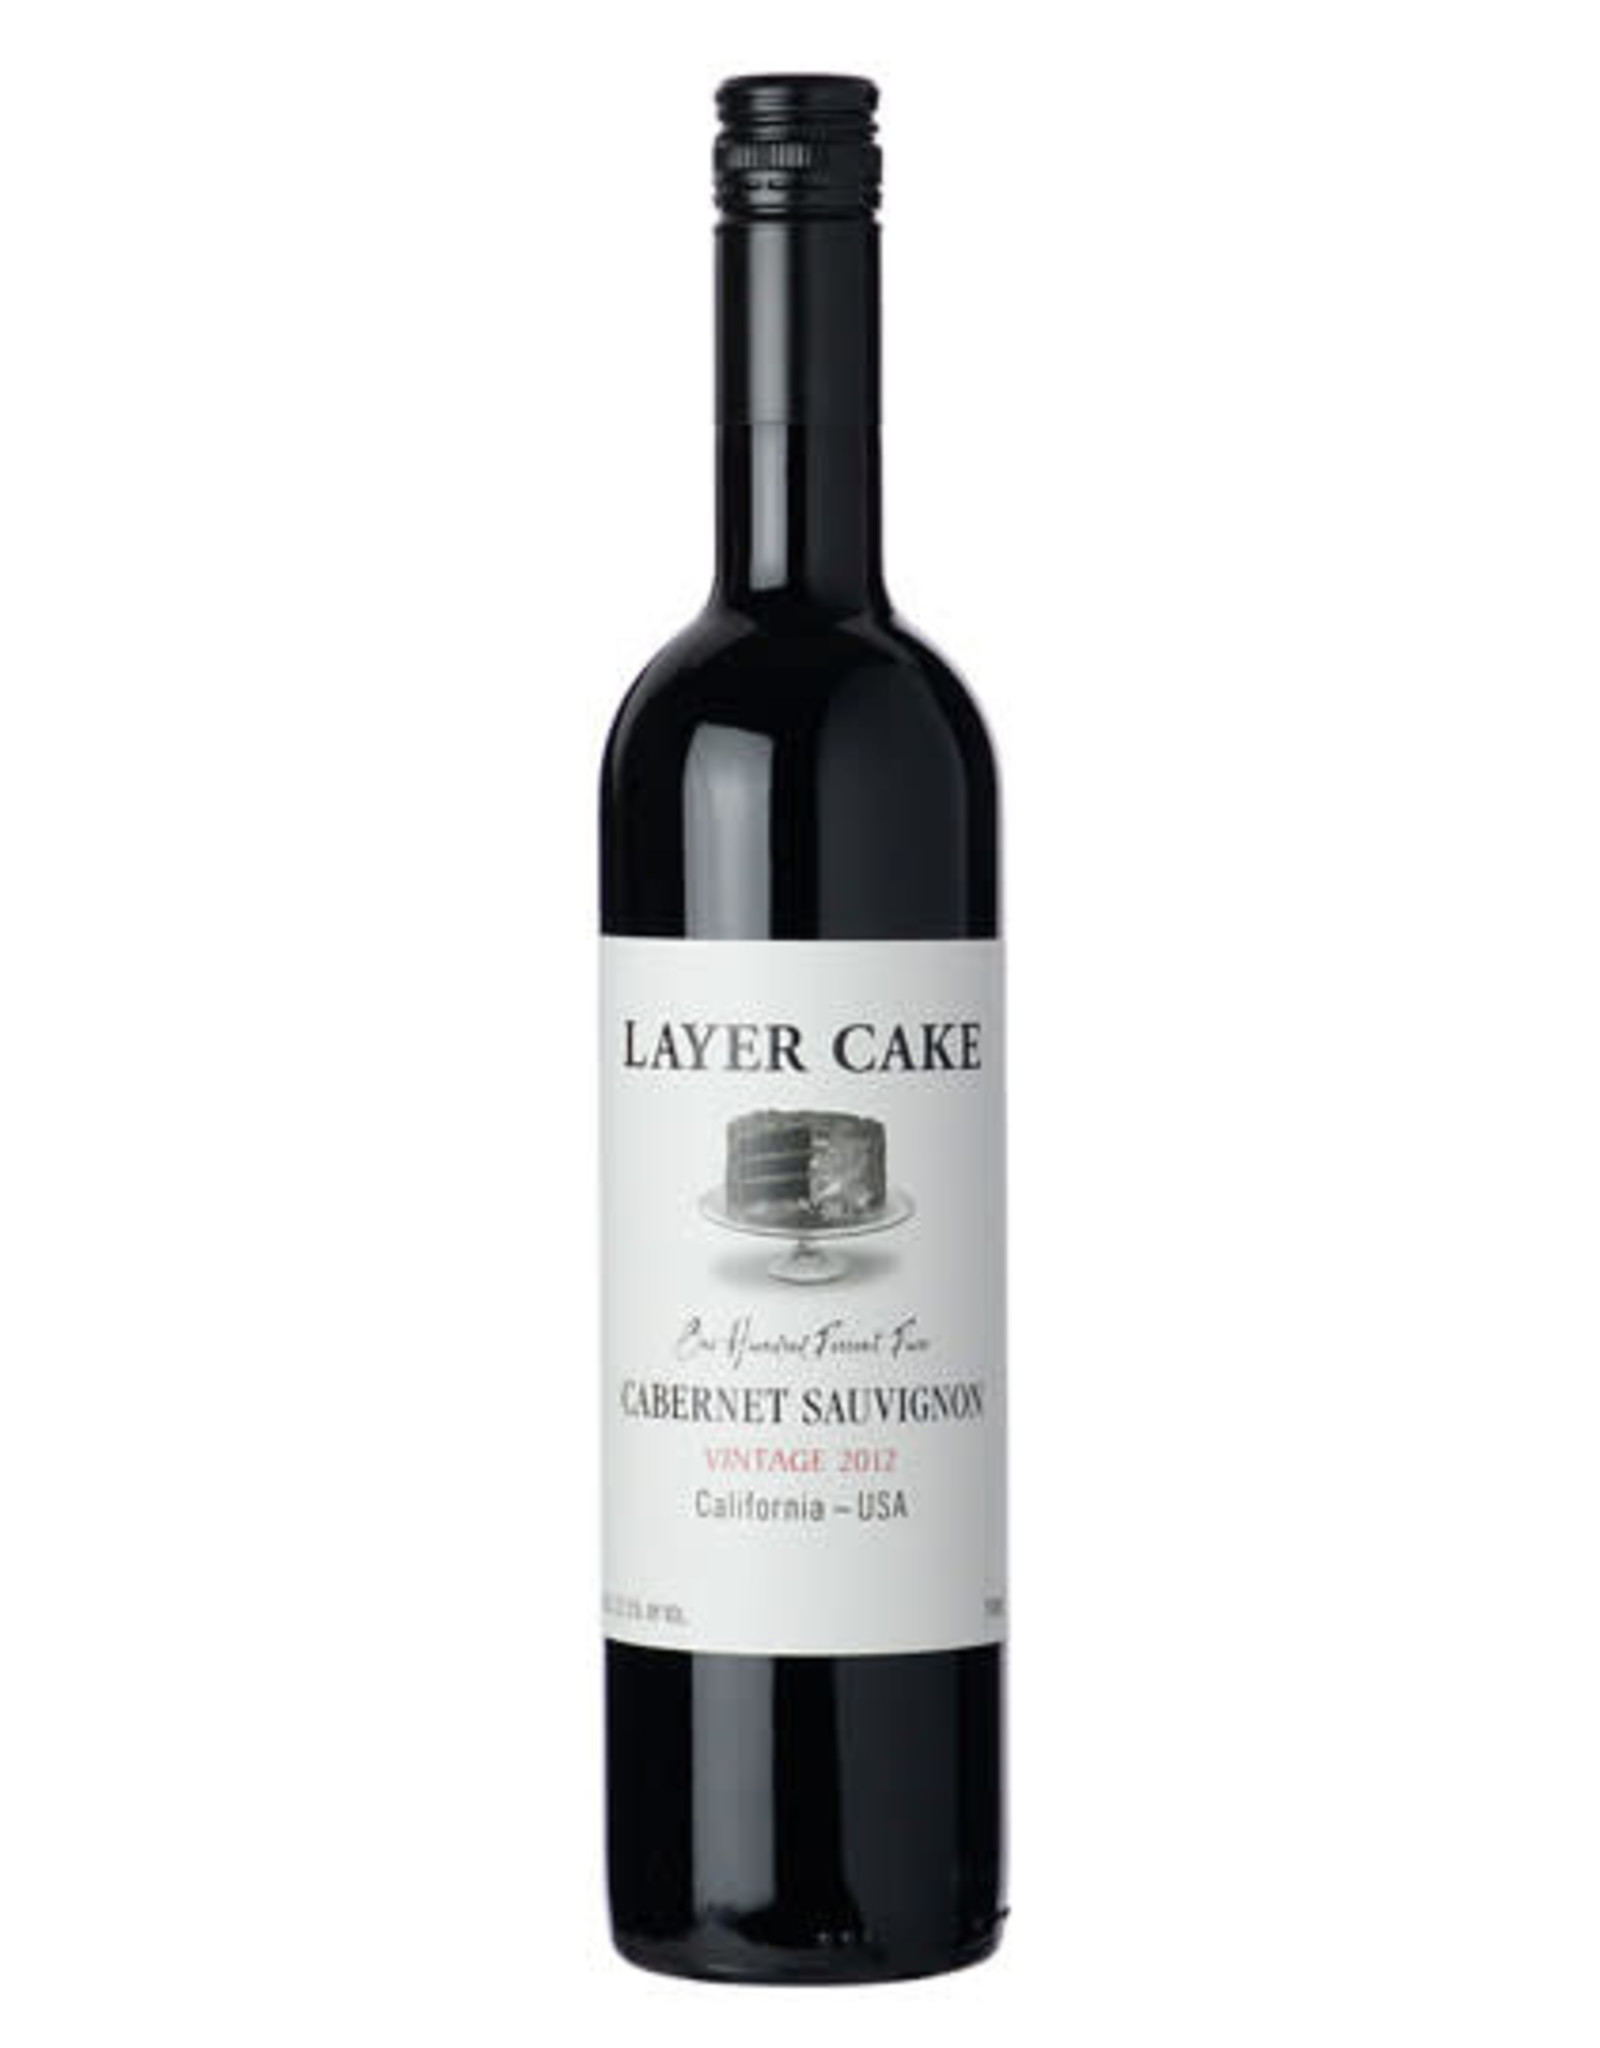 LAYER CAKE CABERNET SAUVIGNON 2012 750ml